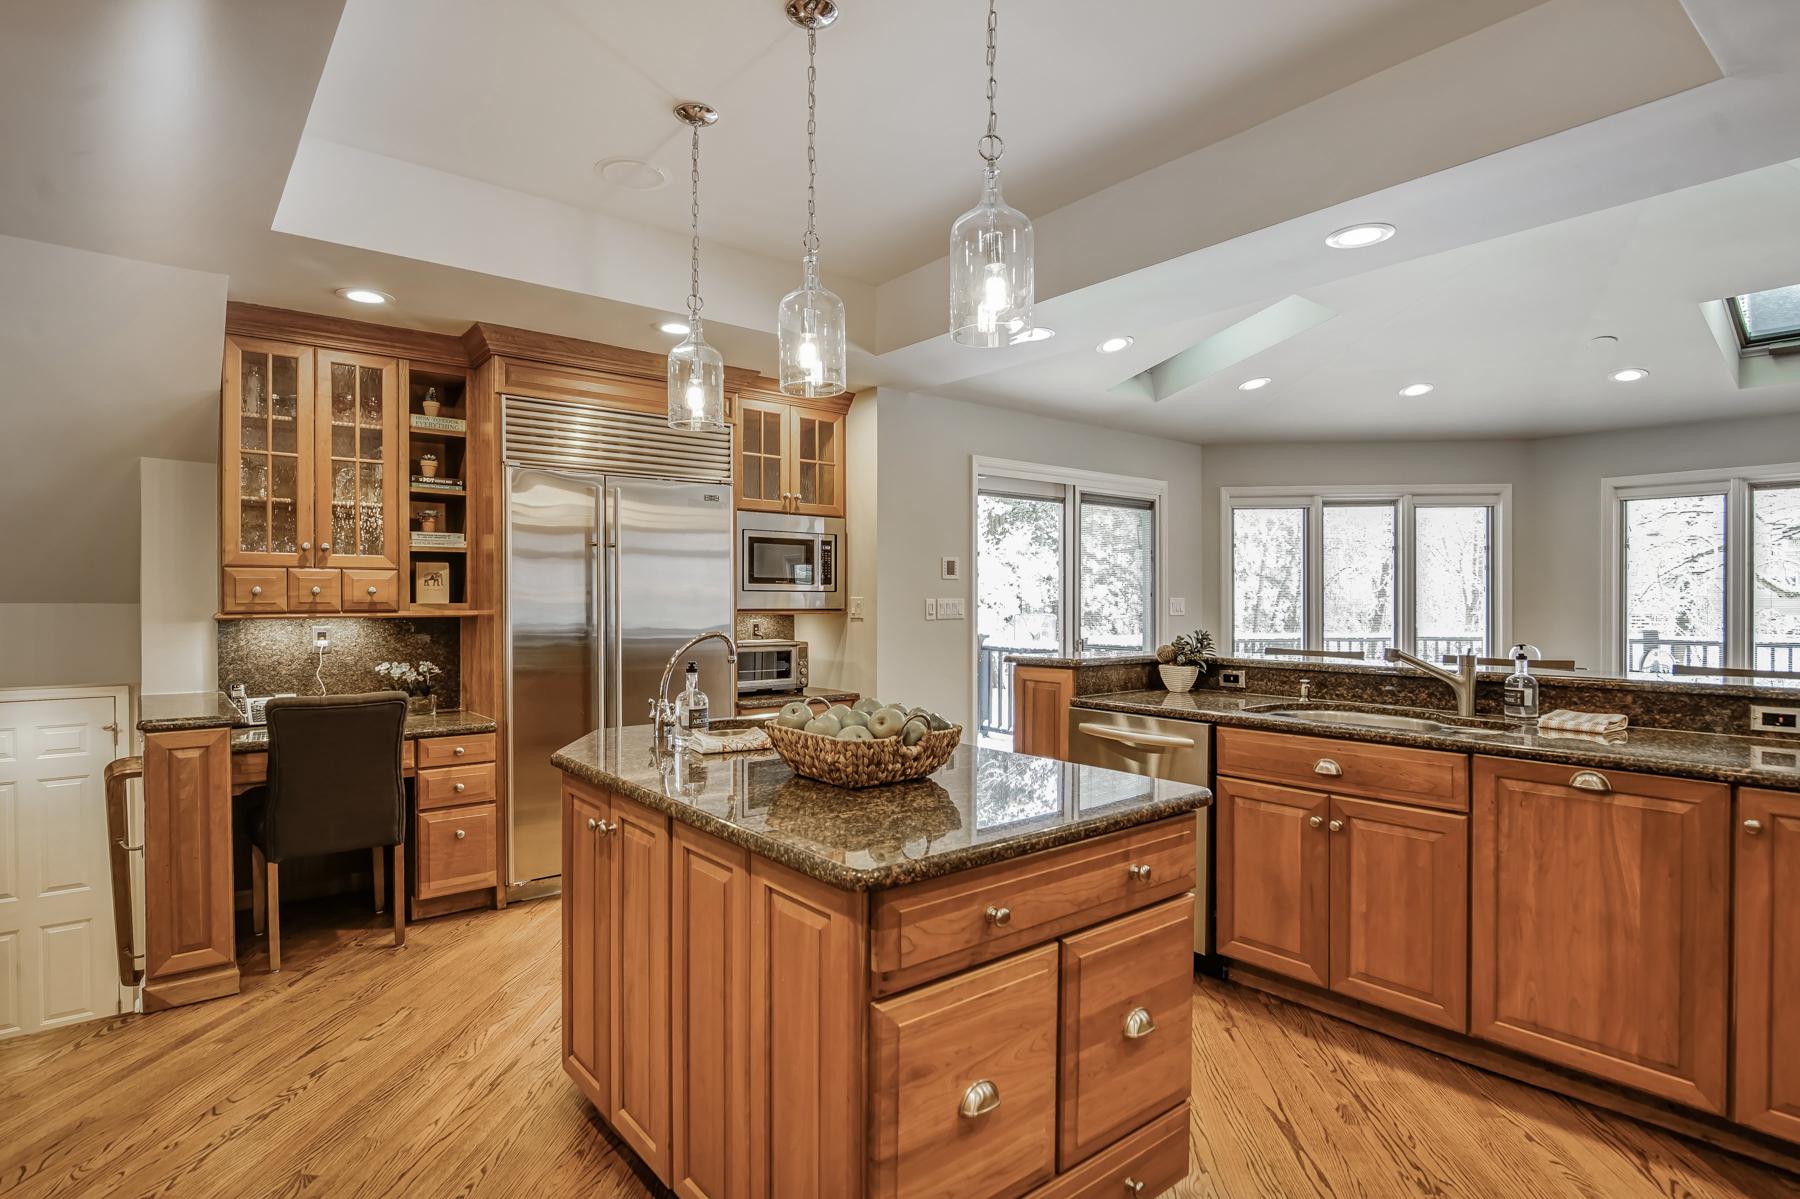 6. Gourmet Kitchen with Granite Island